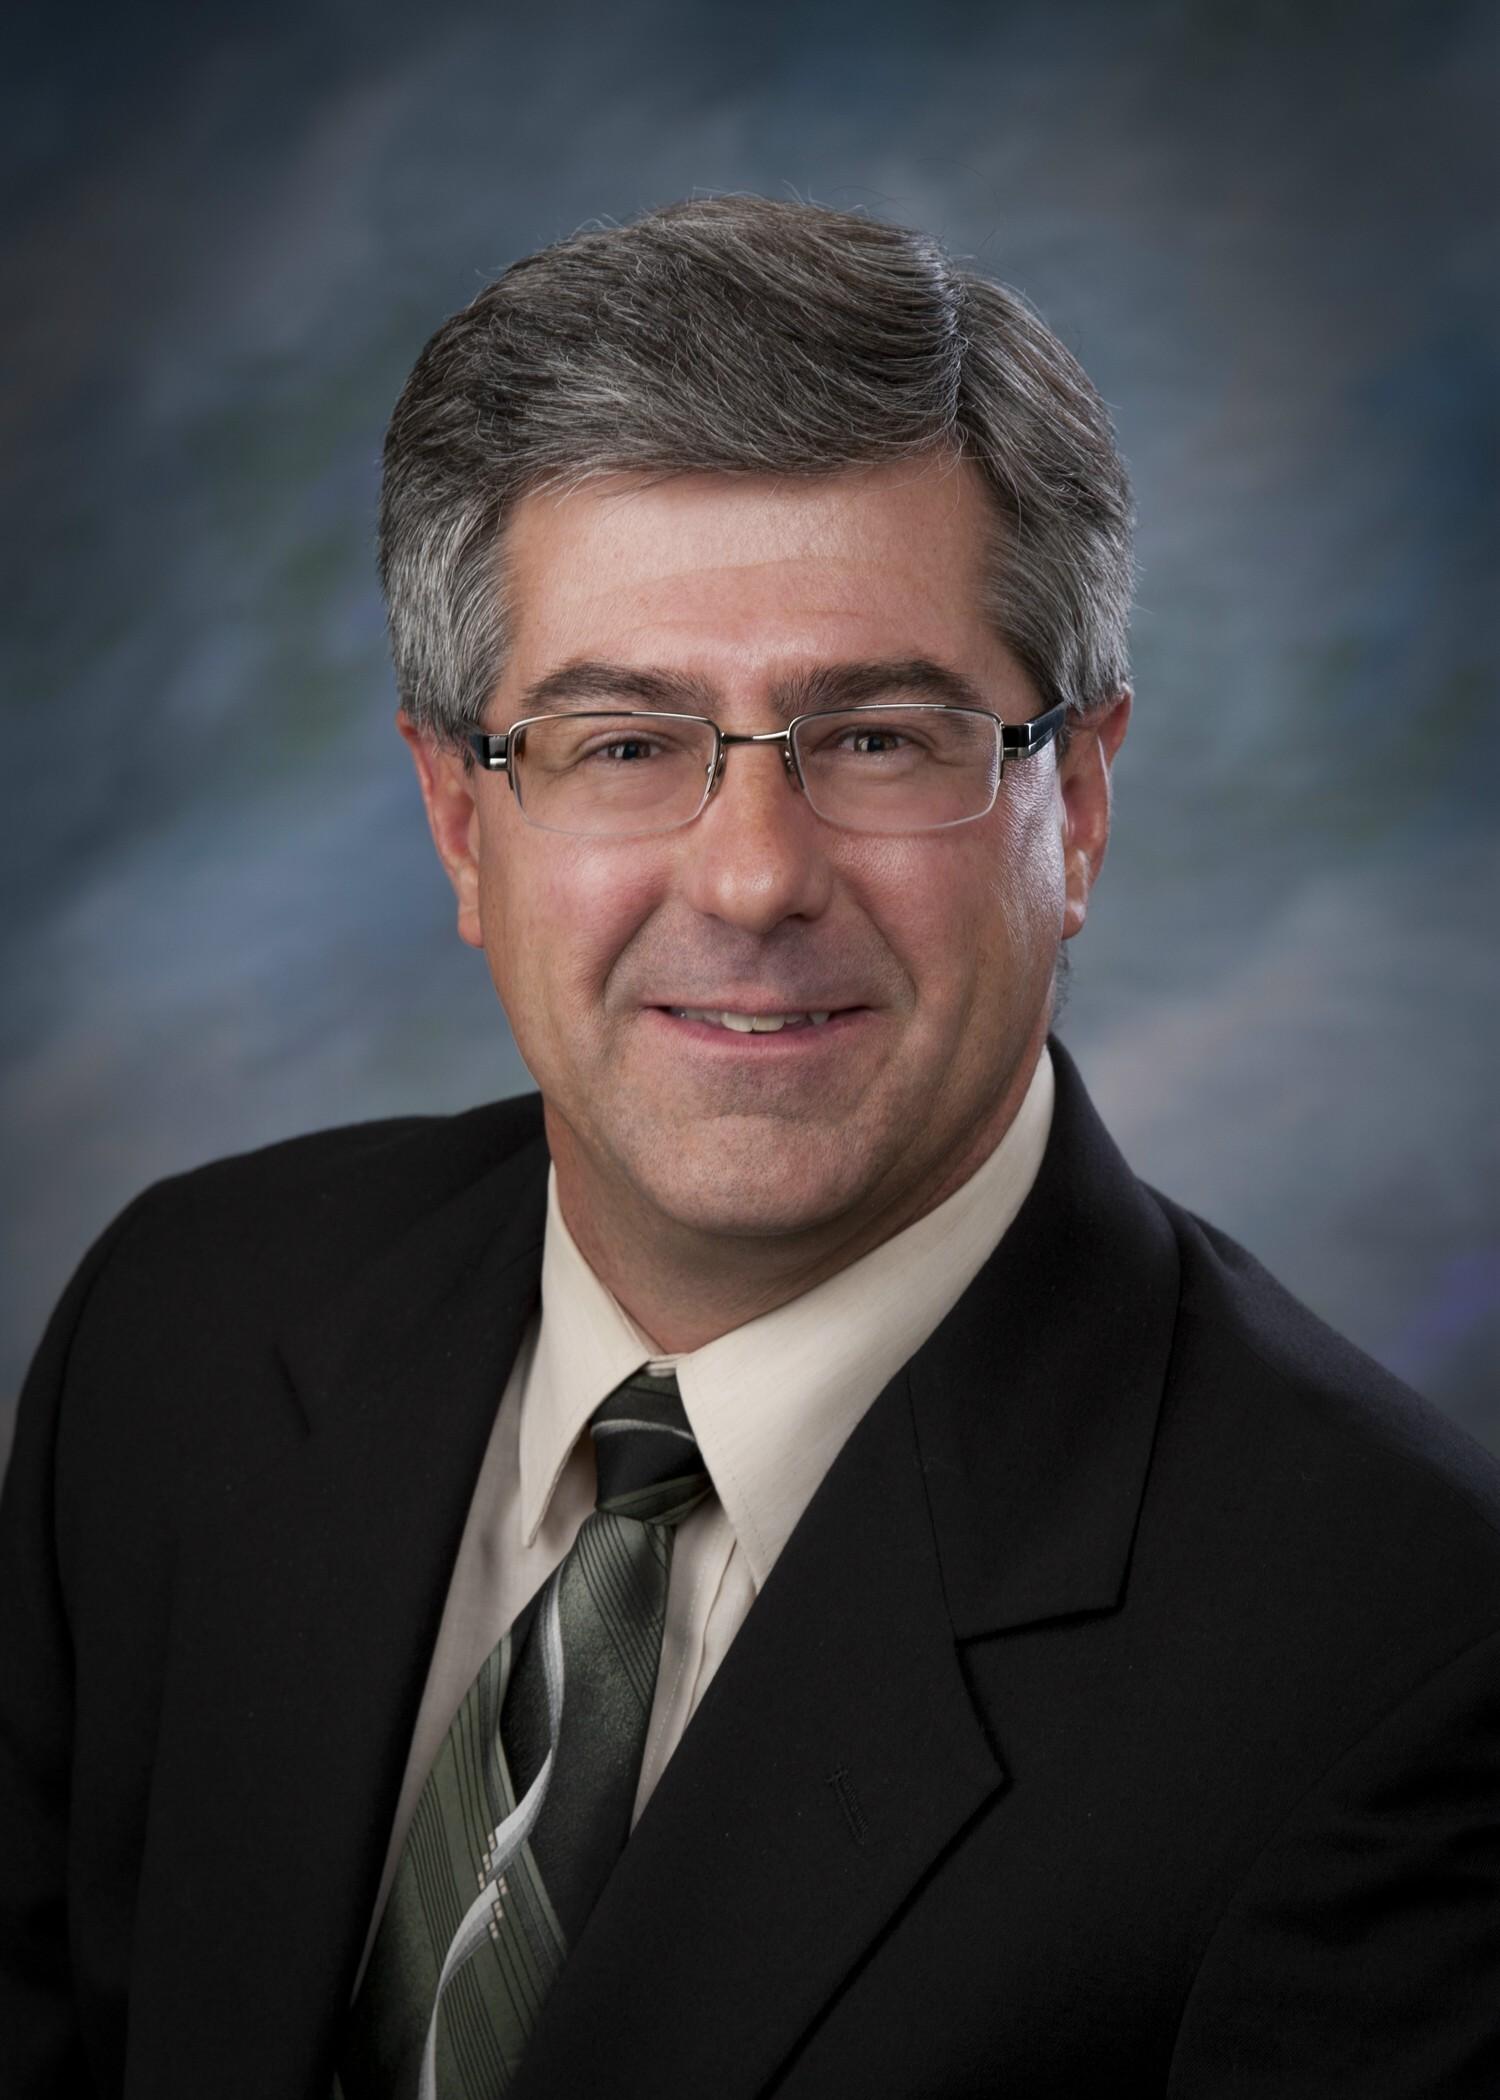 Kevin Keller